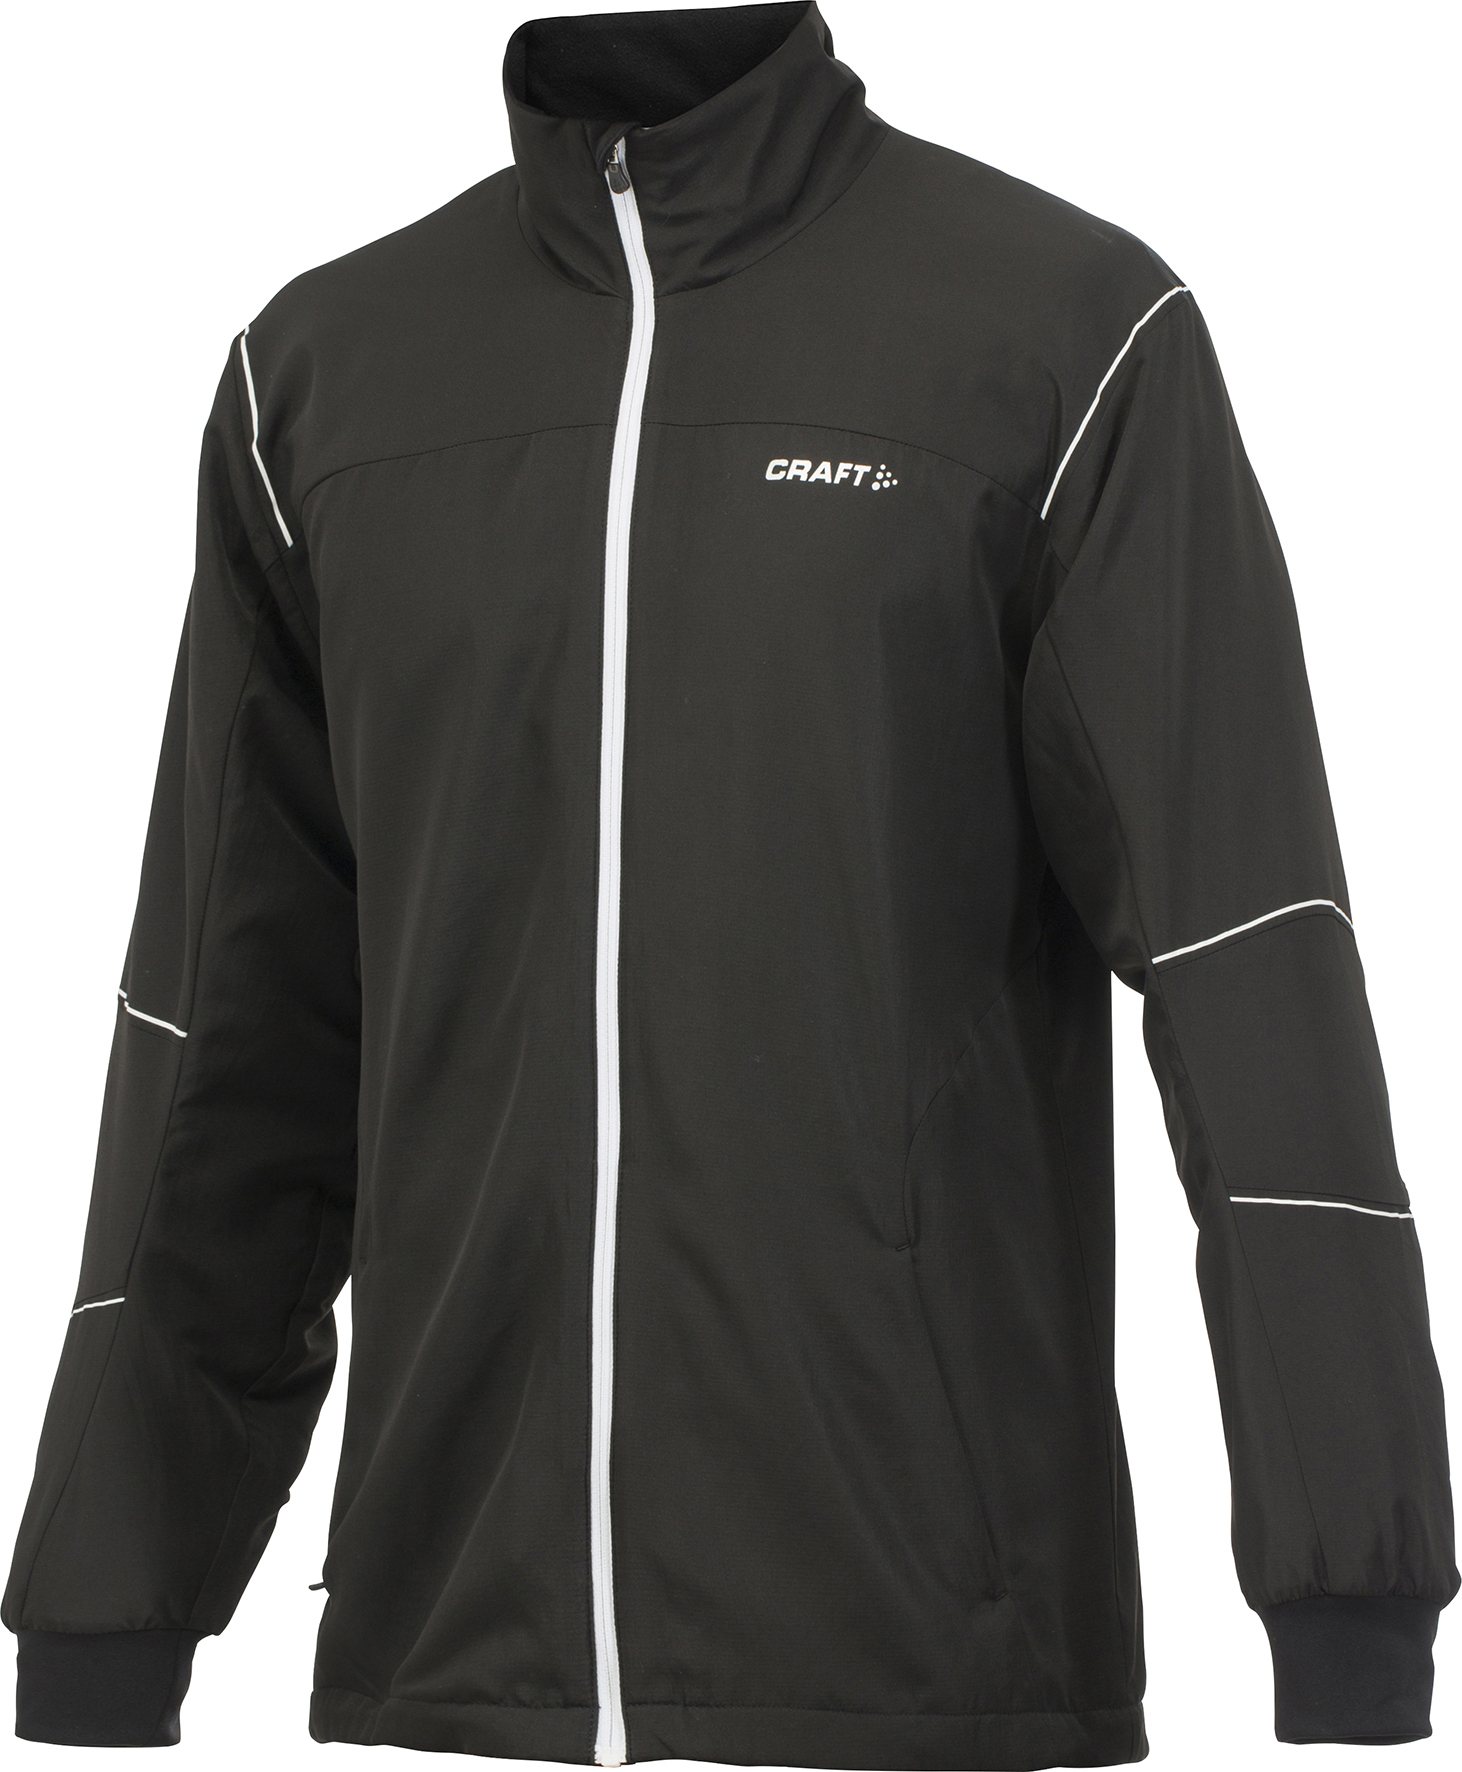 Лыжная Куртка Craft AXC Touring мужская black